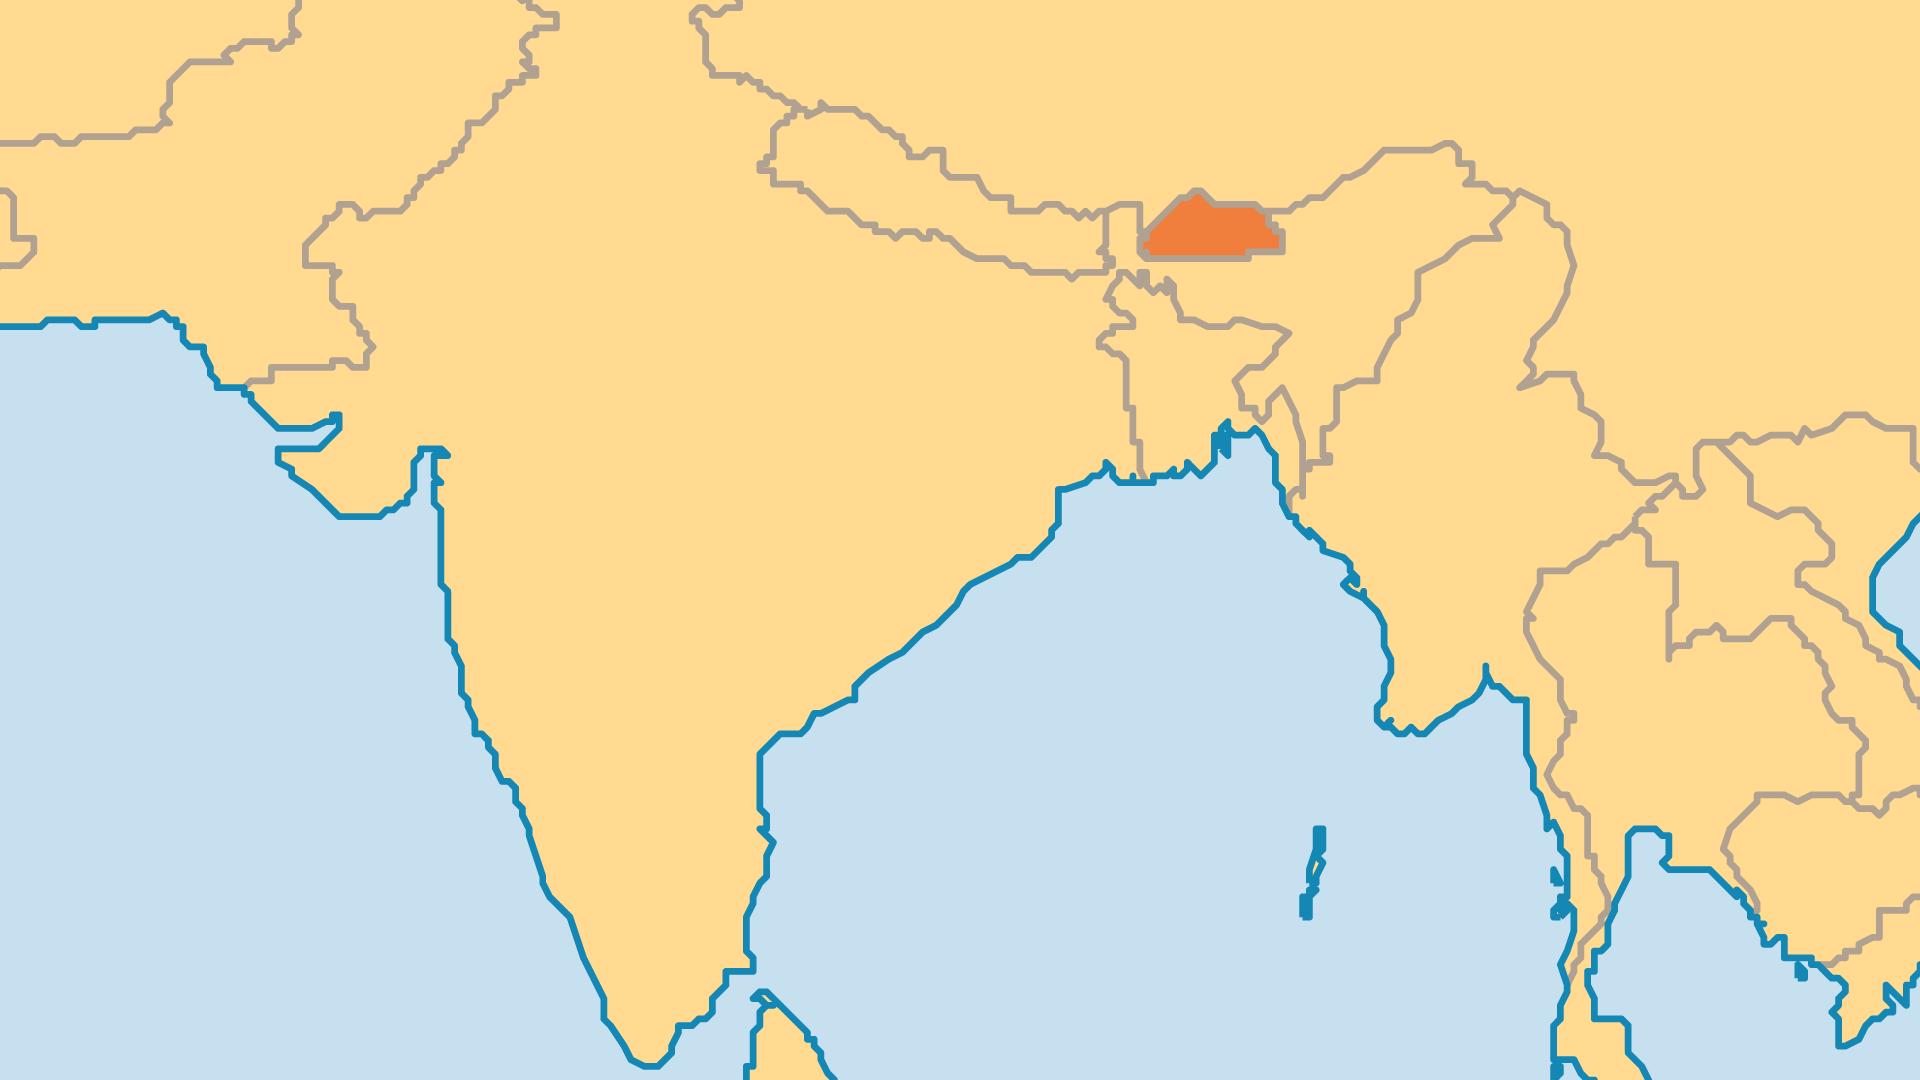 Locator Map for Bhutan